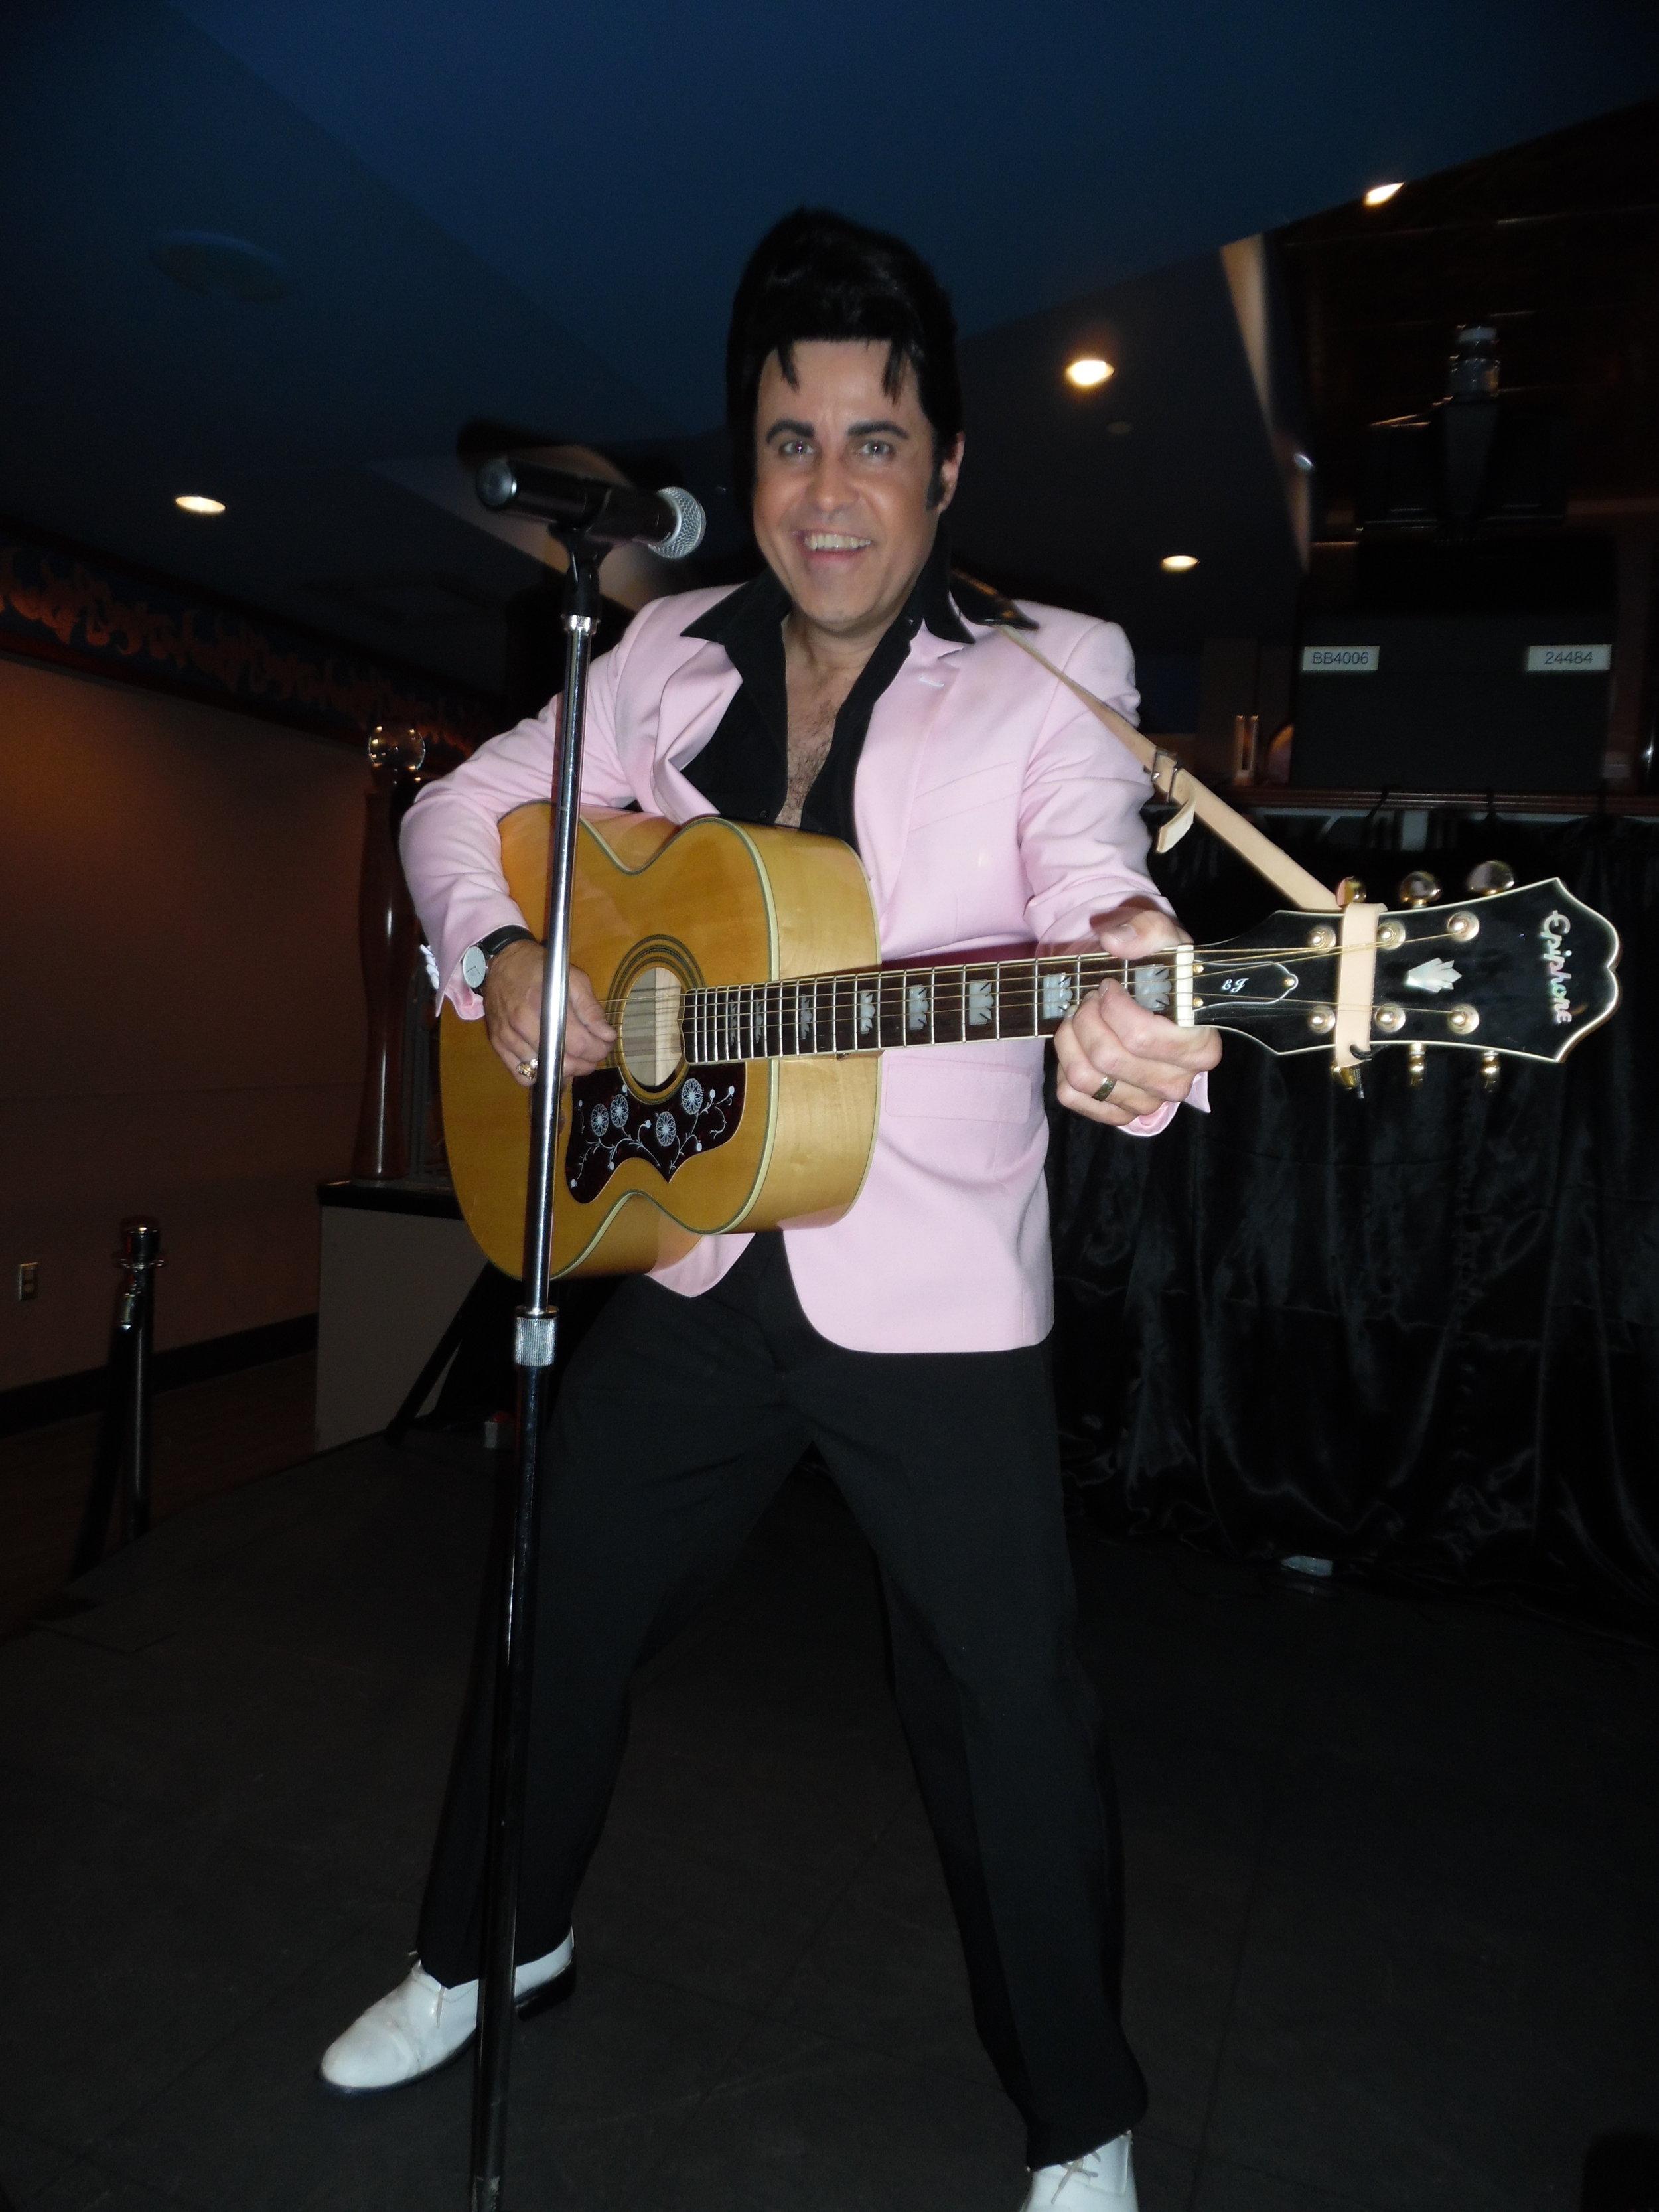 ETA  James Gibb  during his fabulous performance at Flamboro Downs, November 24th, 2017.